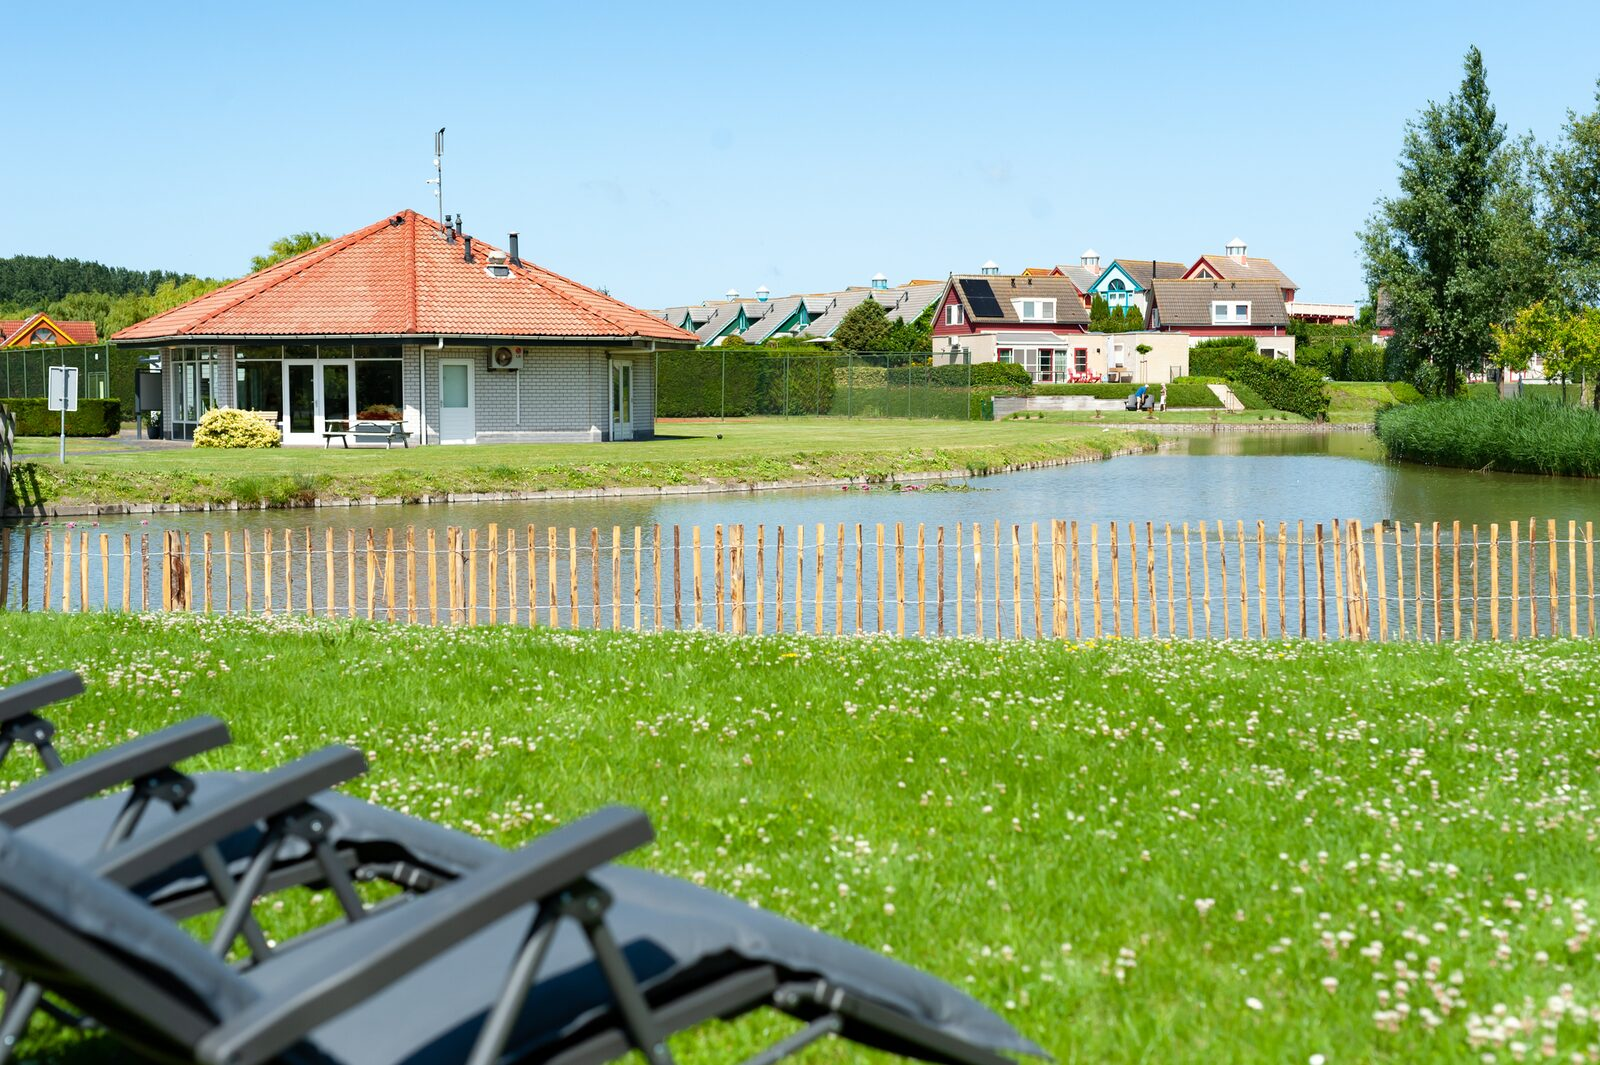 Antibes 258 - Kustpark Village Scaldia